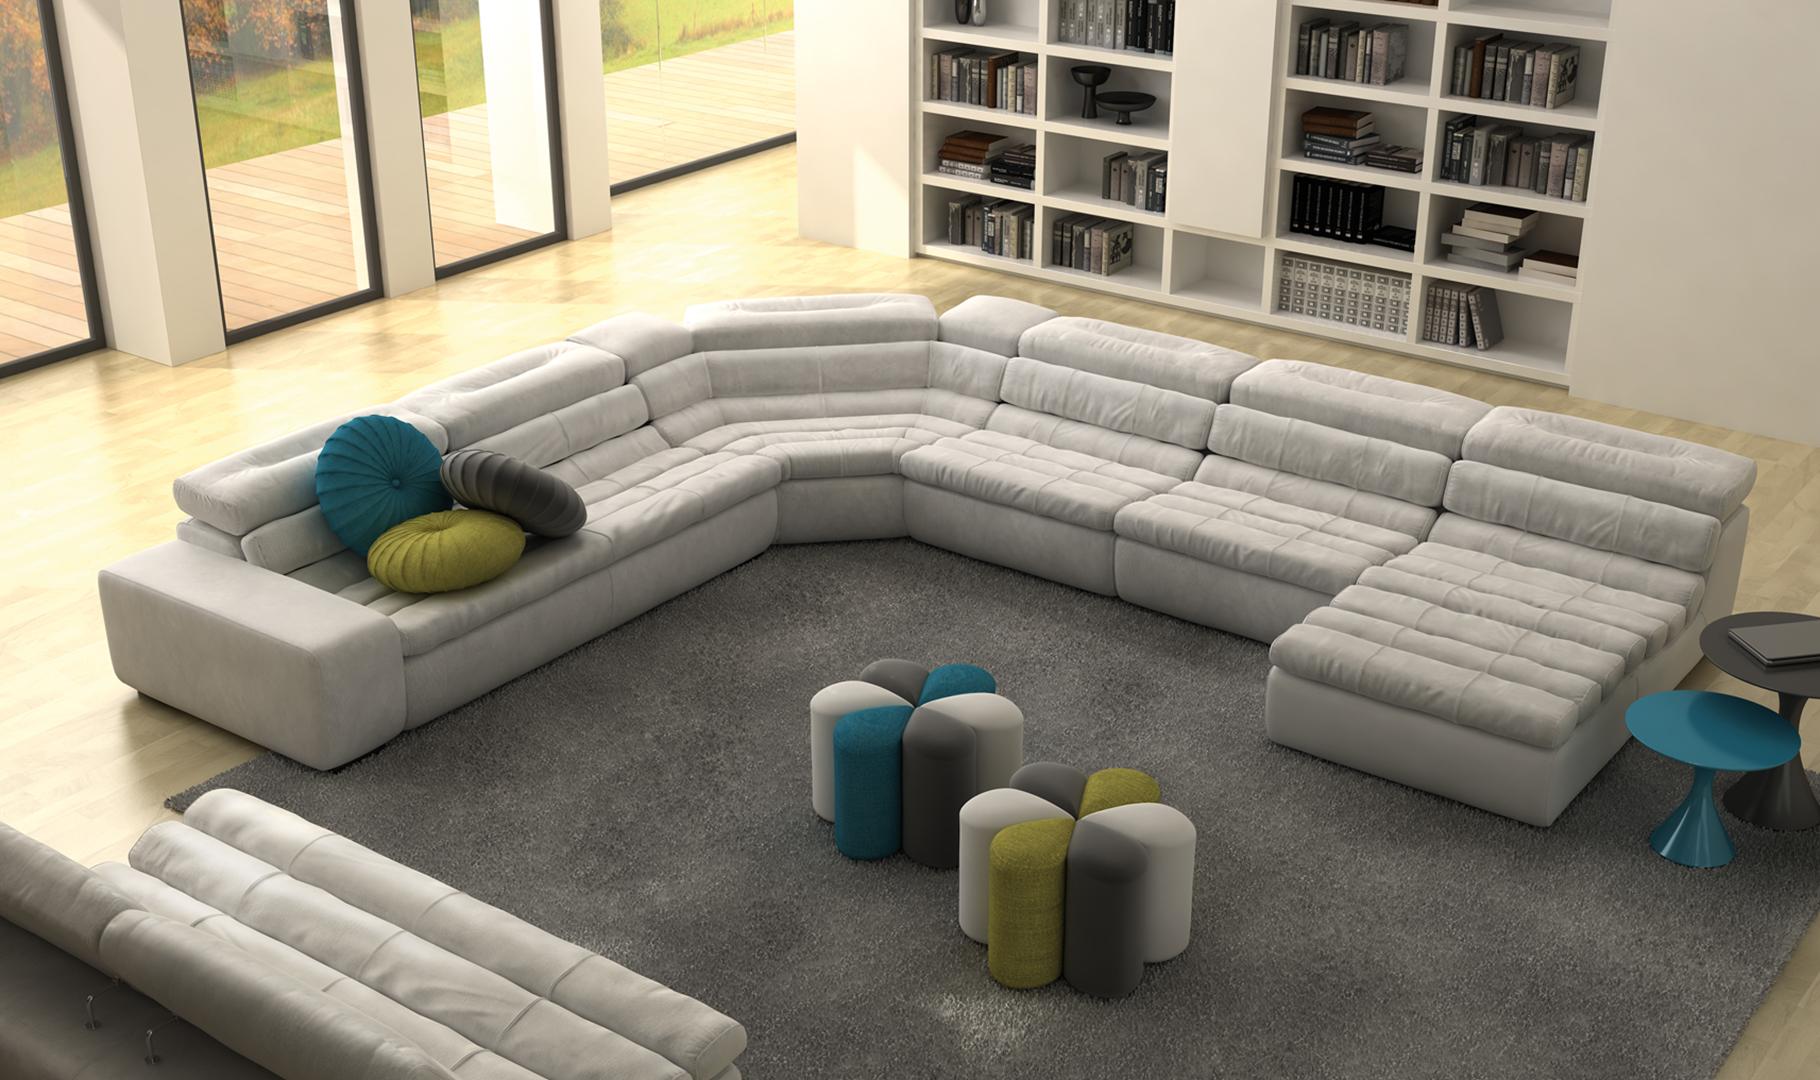 Sofa modular personalizado